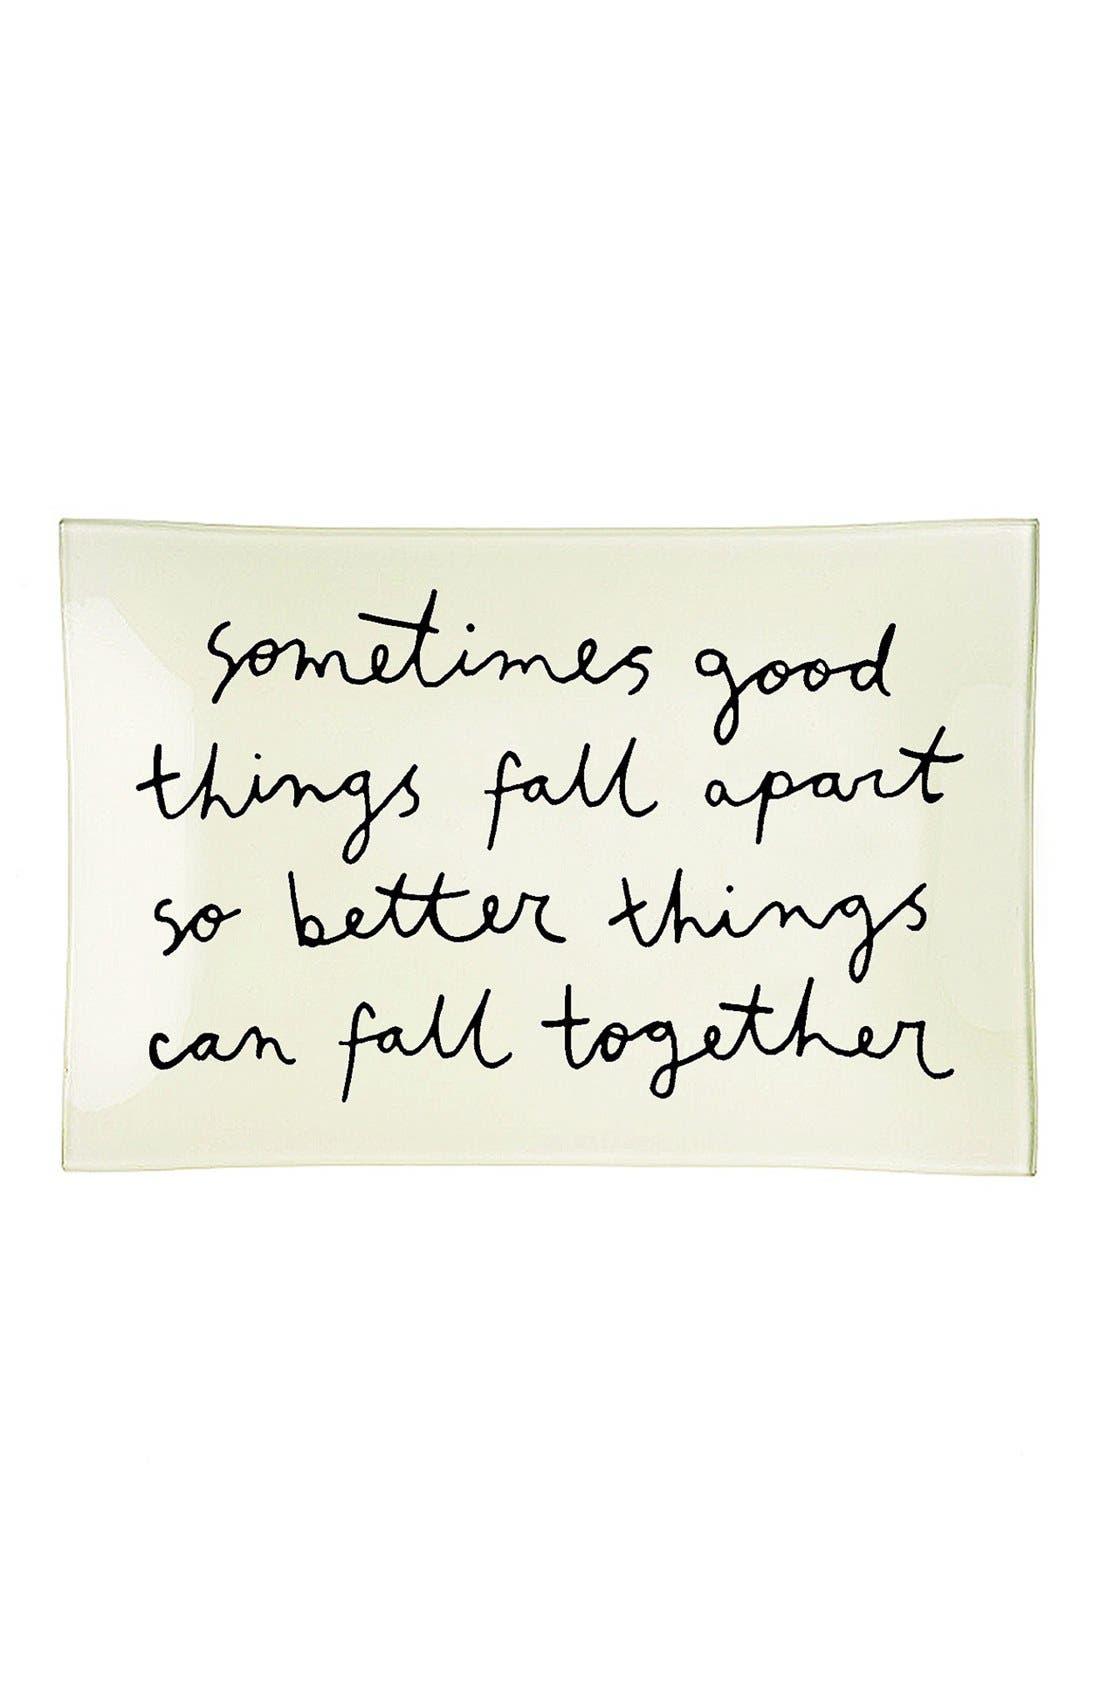 Alternate Image 1 Selected - Ben's Garden 'Sometimes Good Things Fall Apart' Trinket Tray